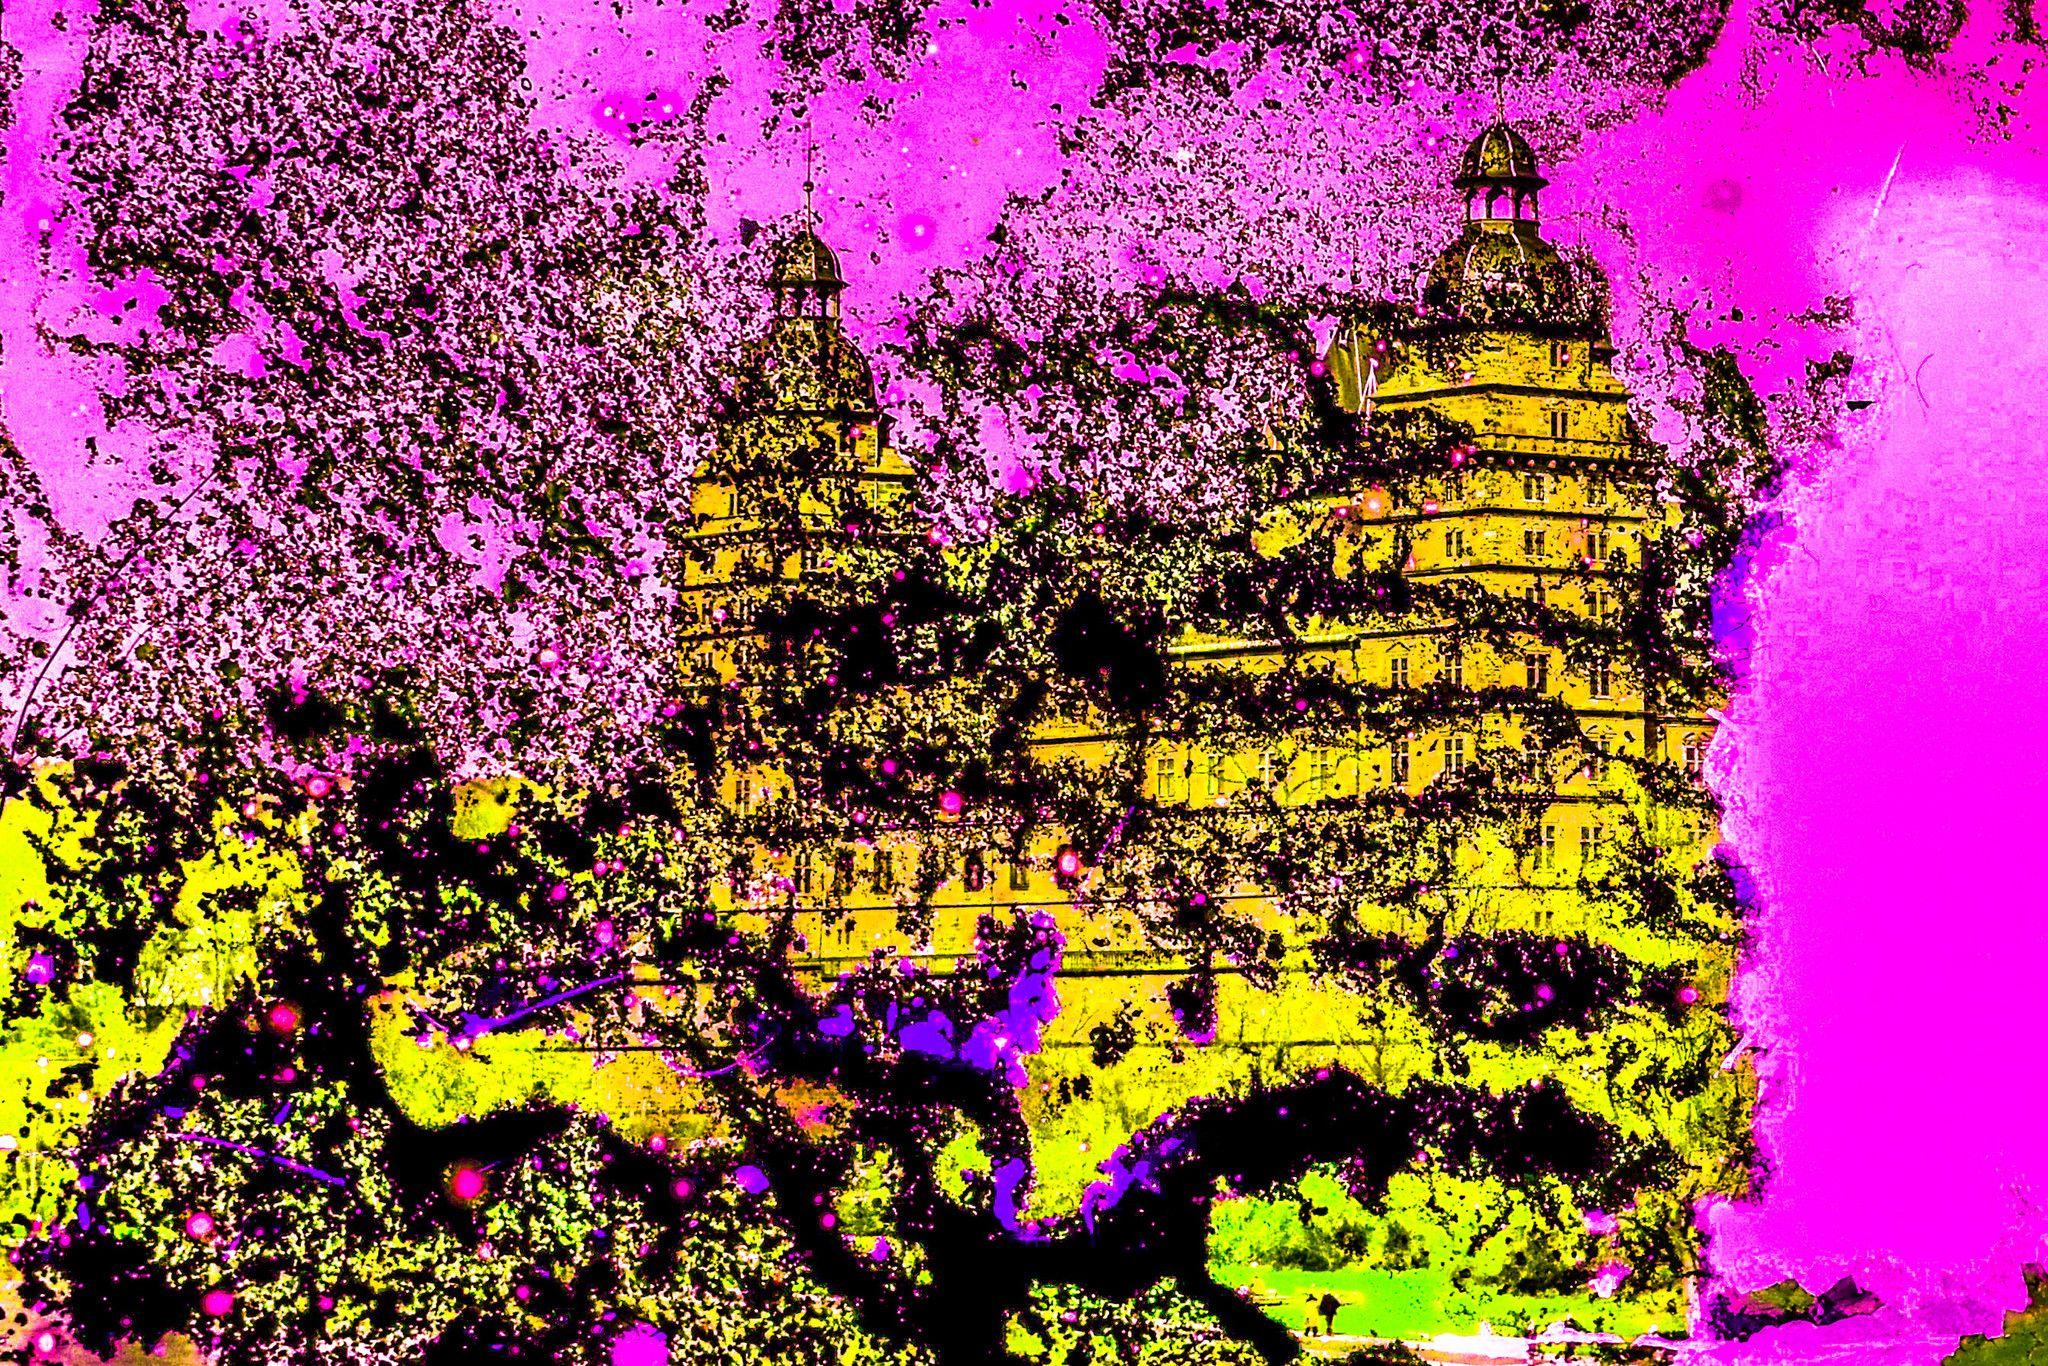 "FOTOGRAFIA GUSE - BORNEMANN "" CASTELLO DI ASCHAFFENBURG ""  dimensioni L 75 x H 50 cm."